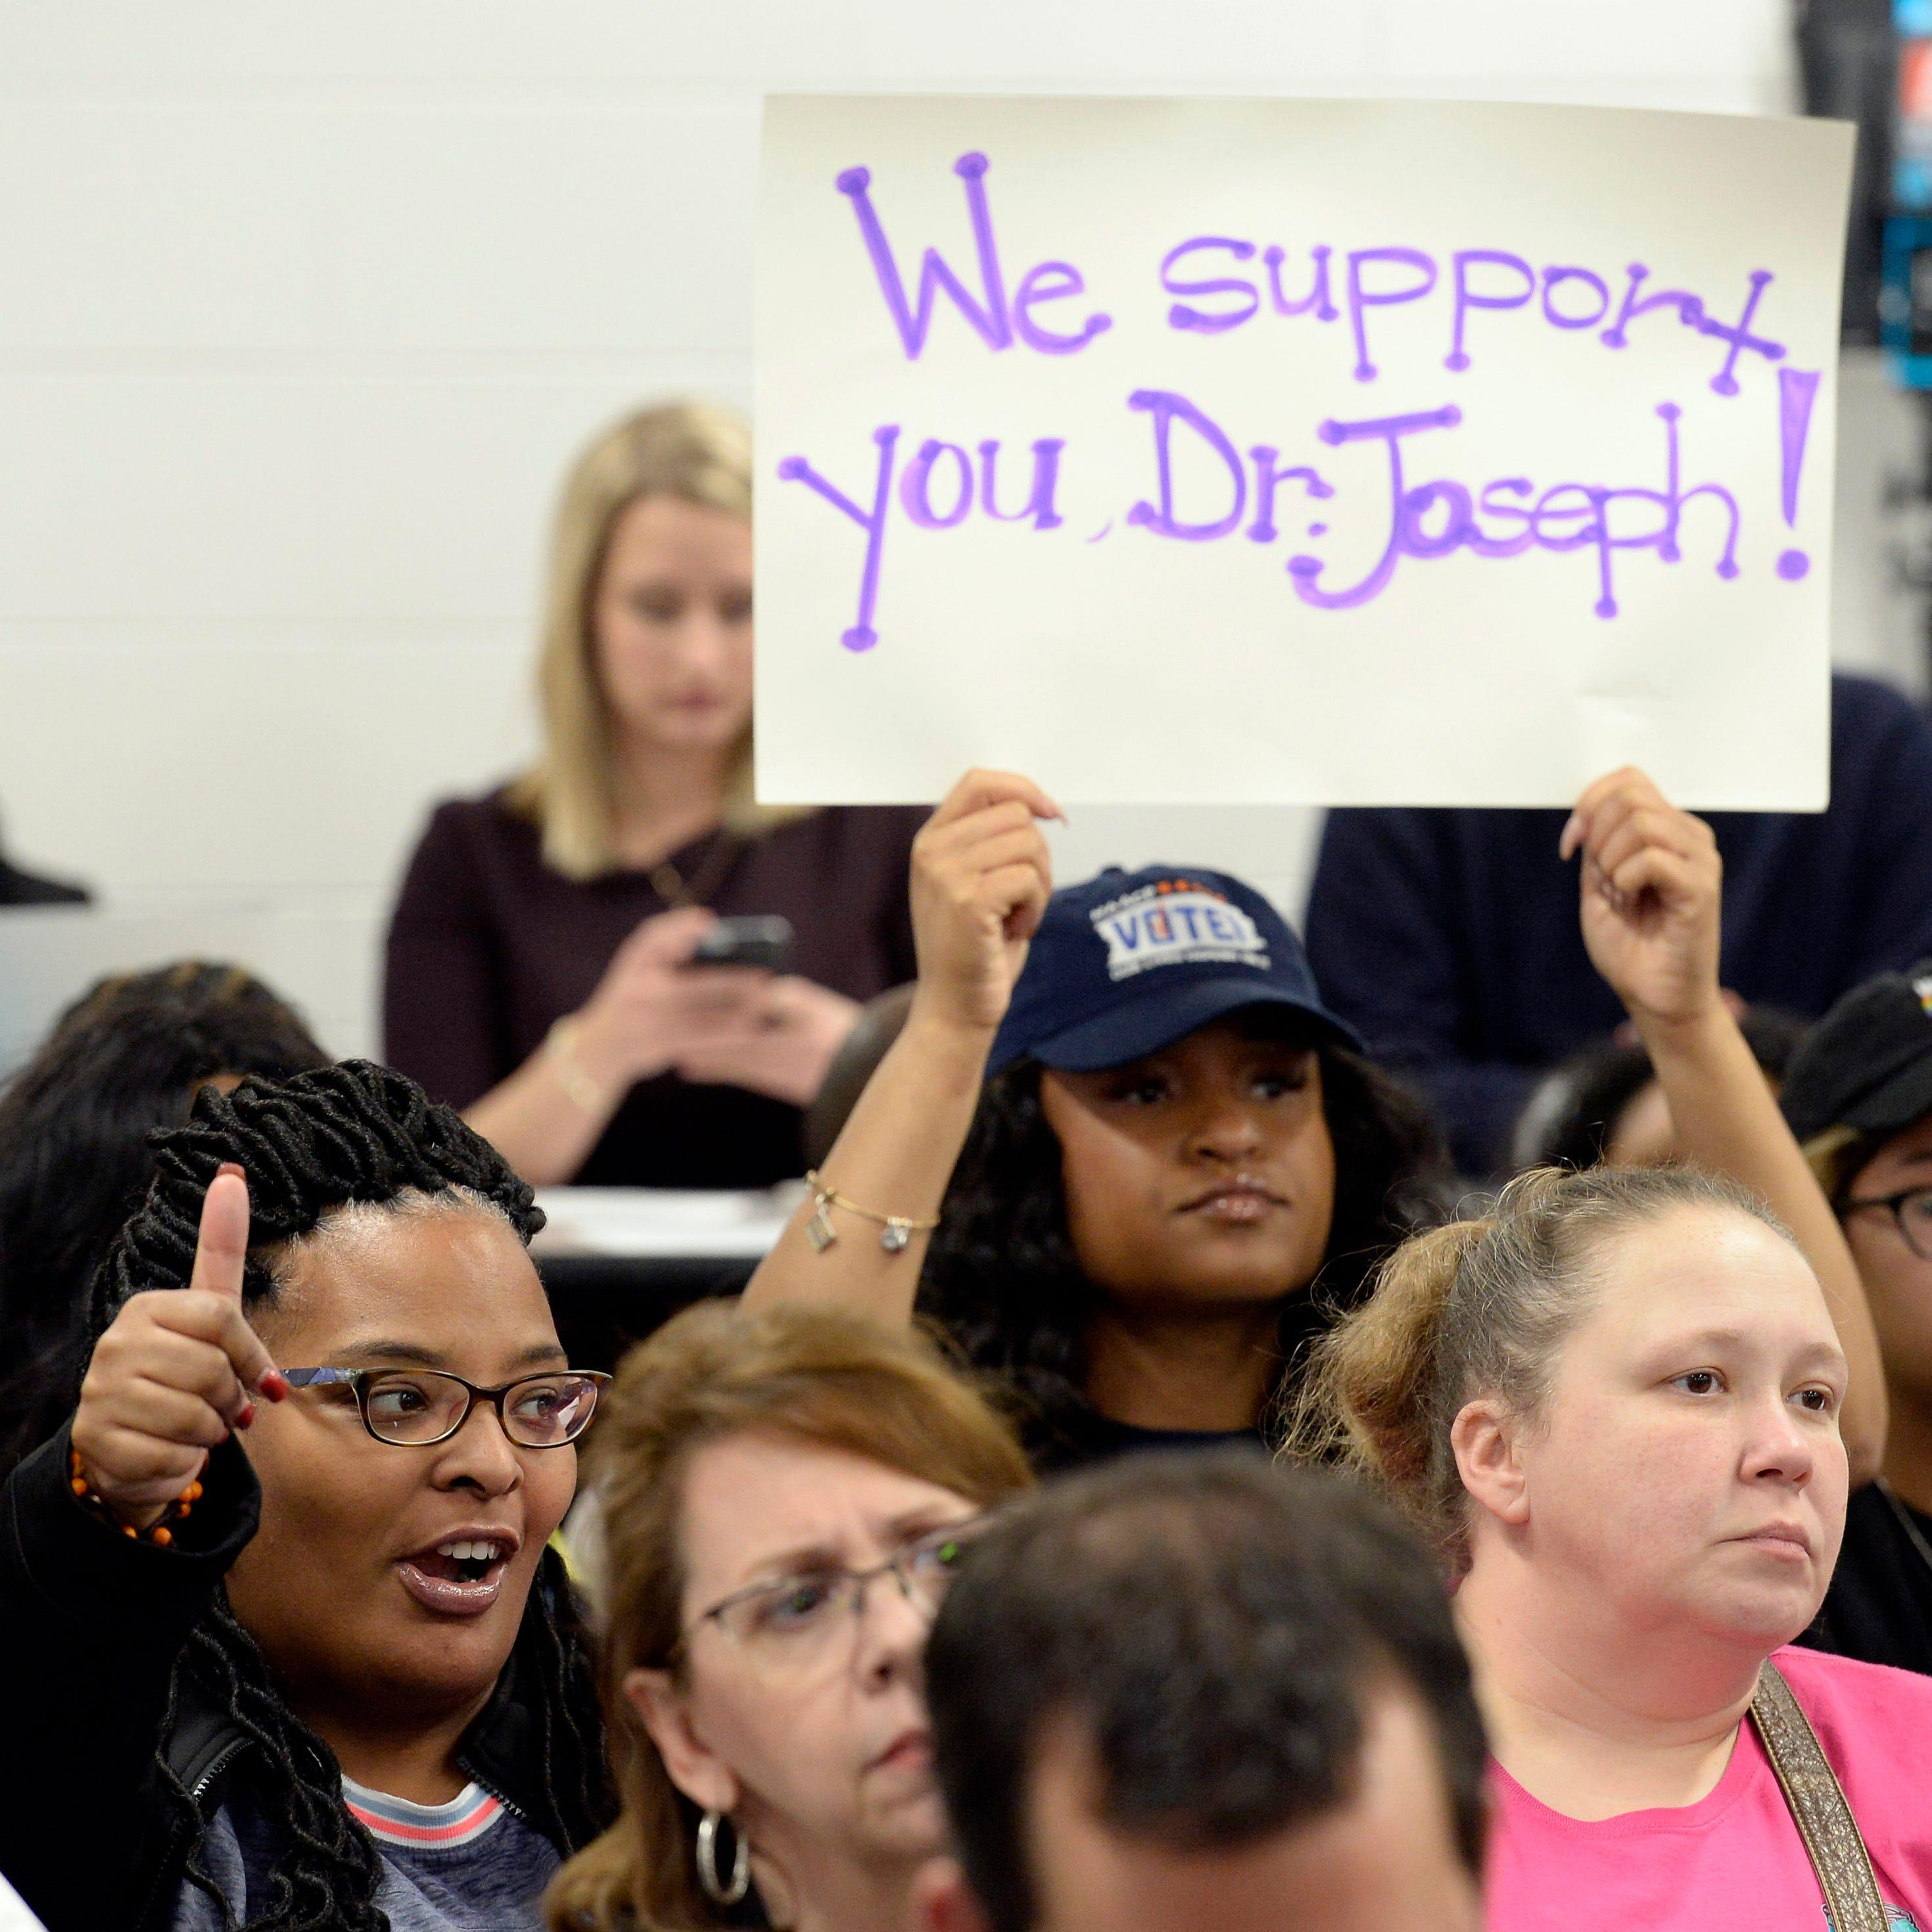 Metro Nashville Public Schools director Shawn Joseph inherited problems, deserves support | Opinion